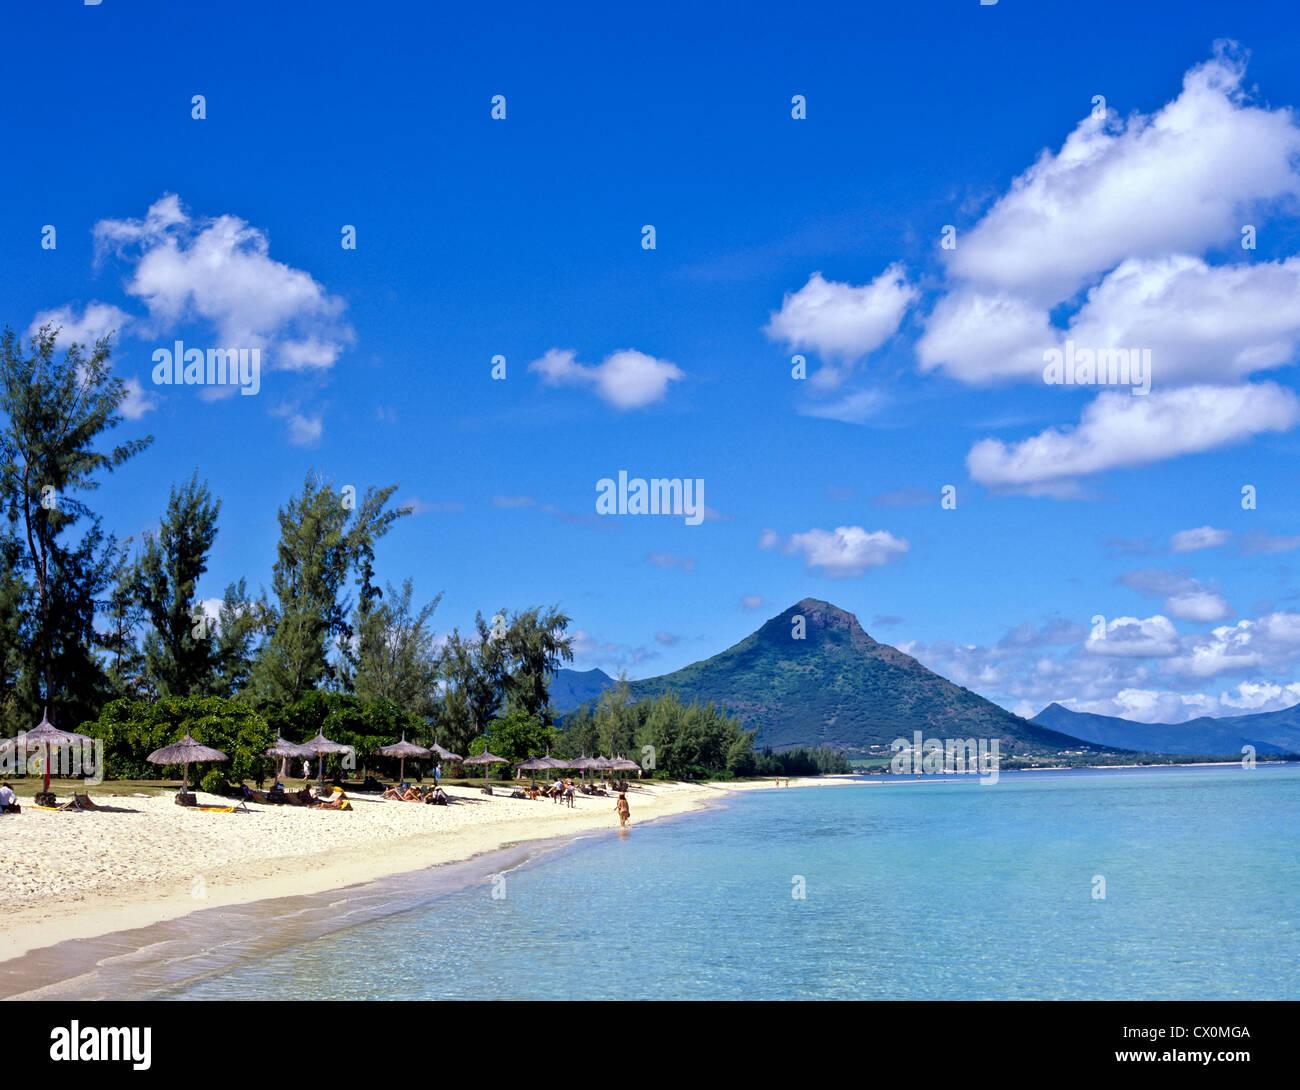 8196. Flik 'n Flak Beach, Mauritius - Stock Image